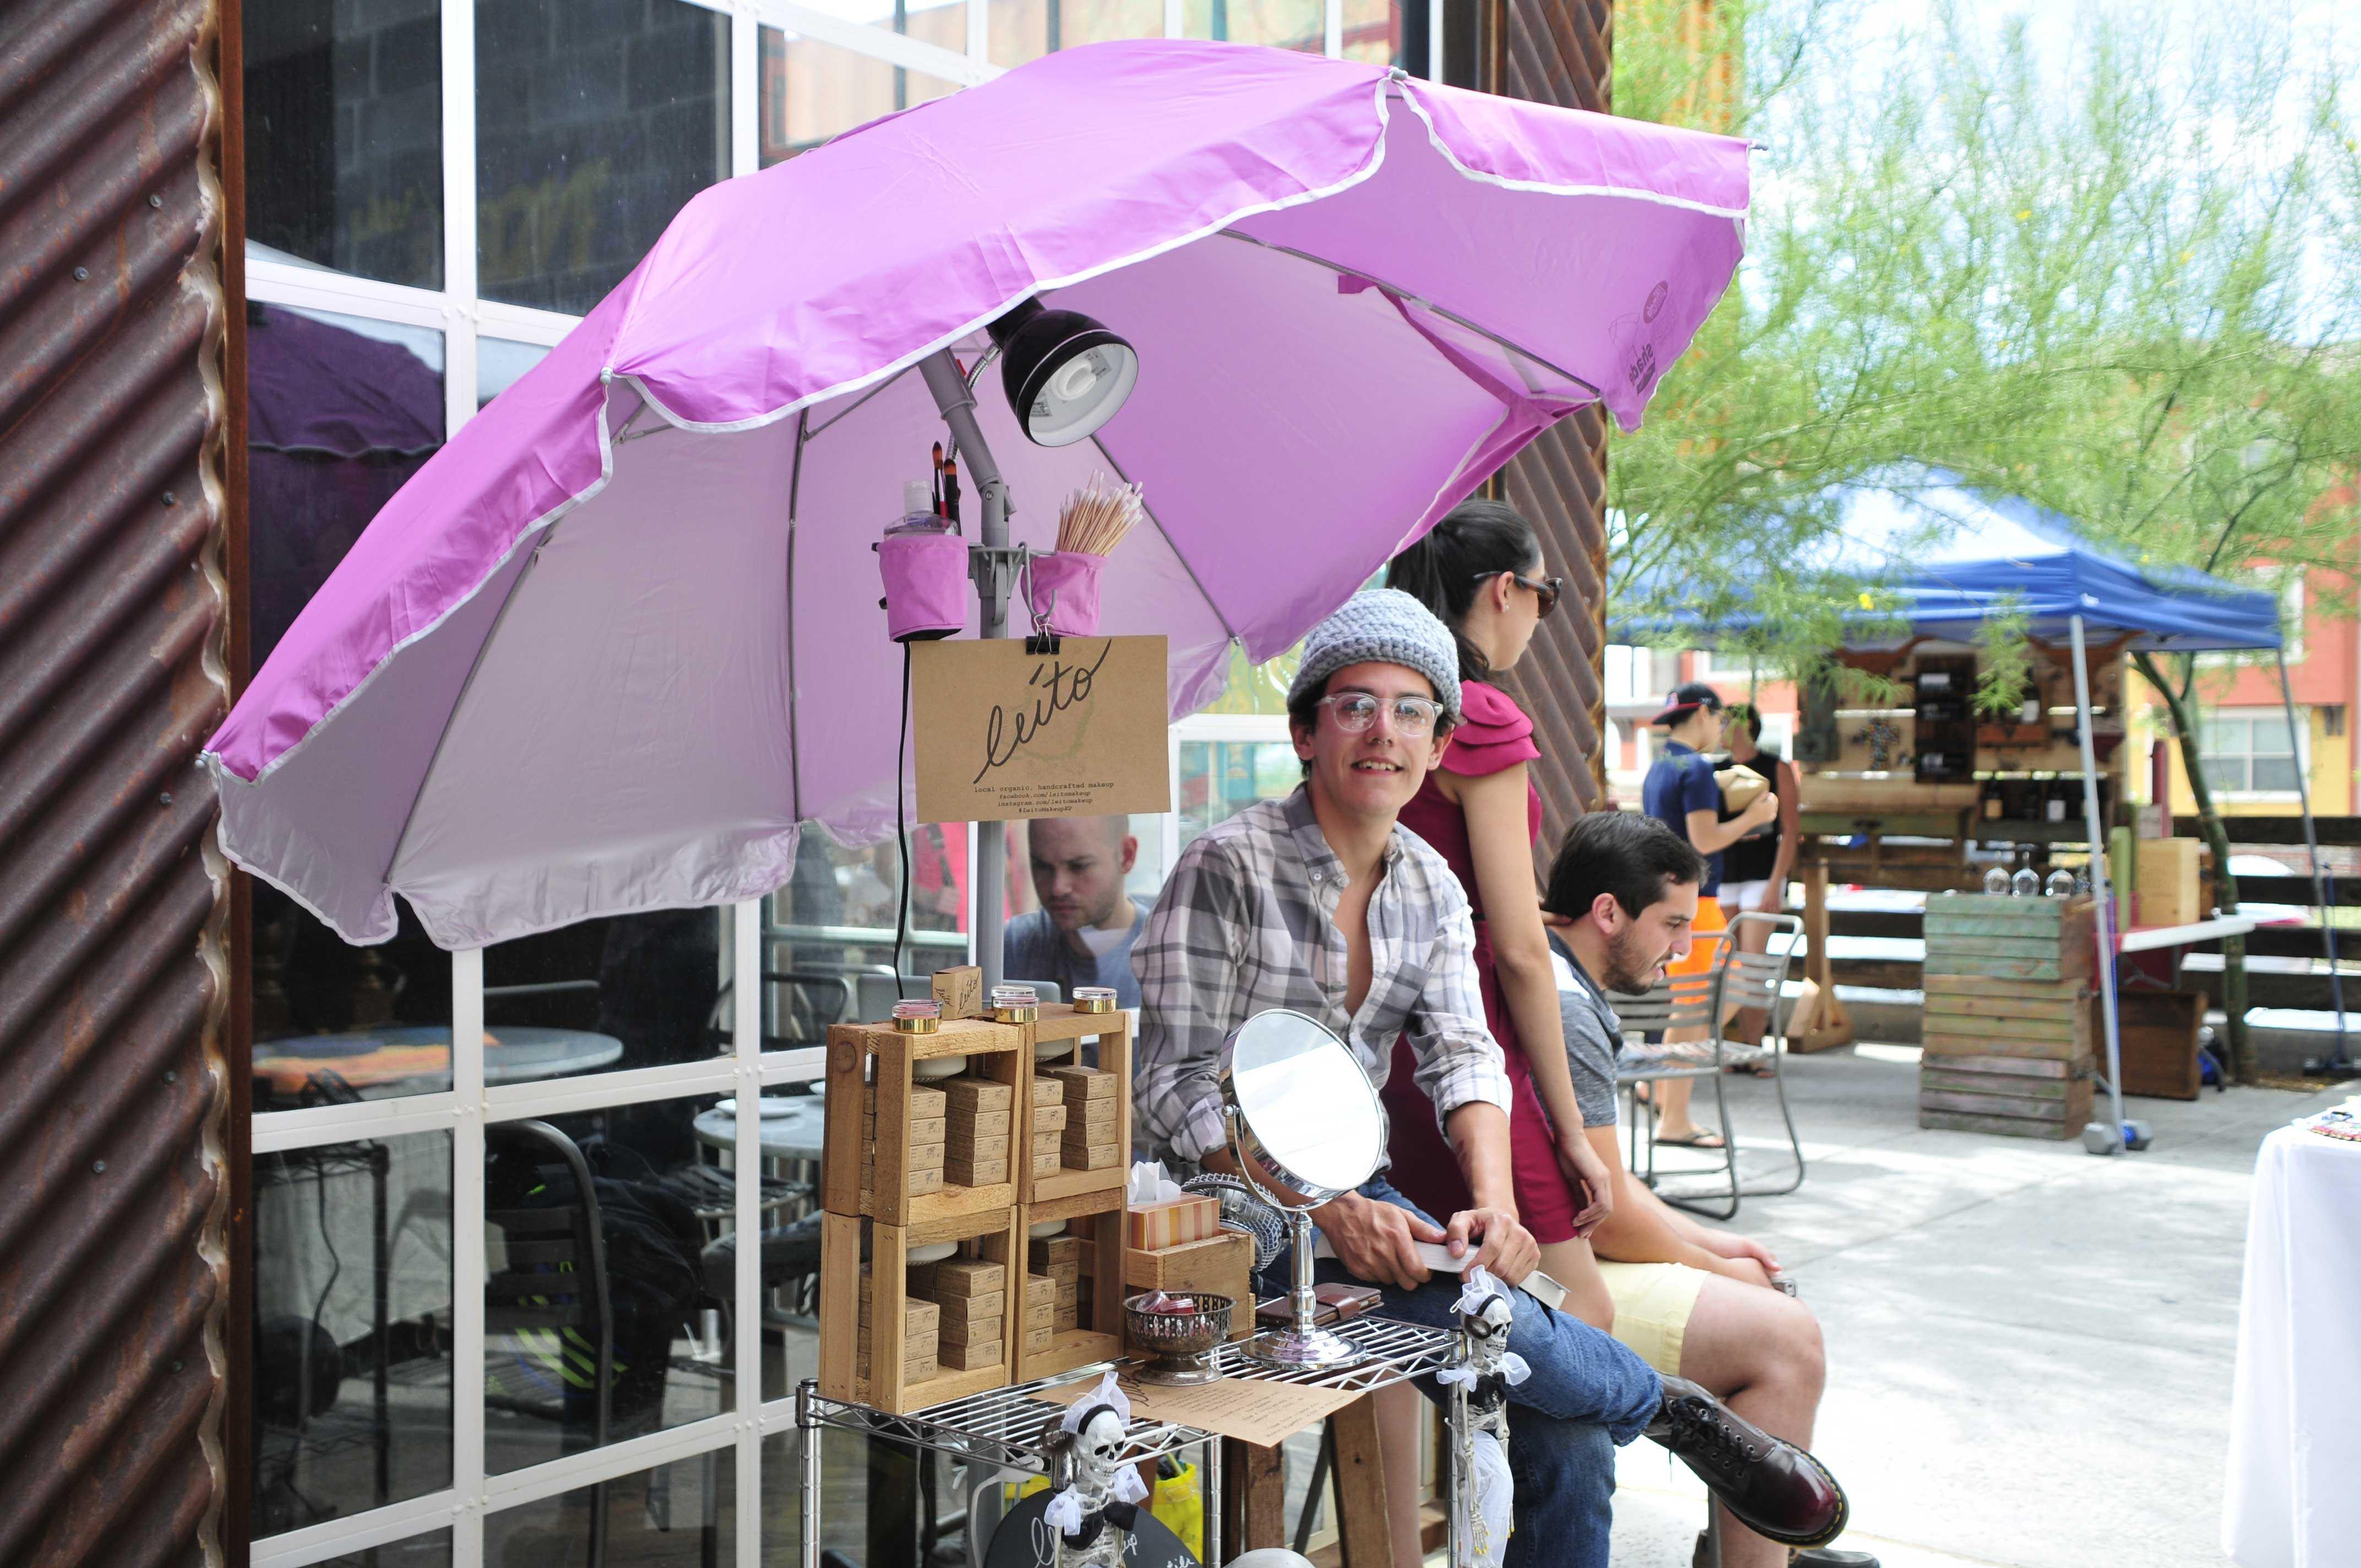 Leito Villalobos Gamboa sells his organic cosmetics at the TI:ME at Montecillo farmer's market.